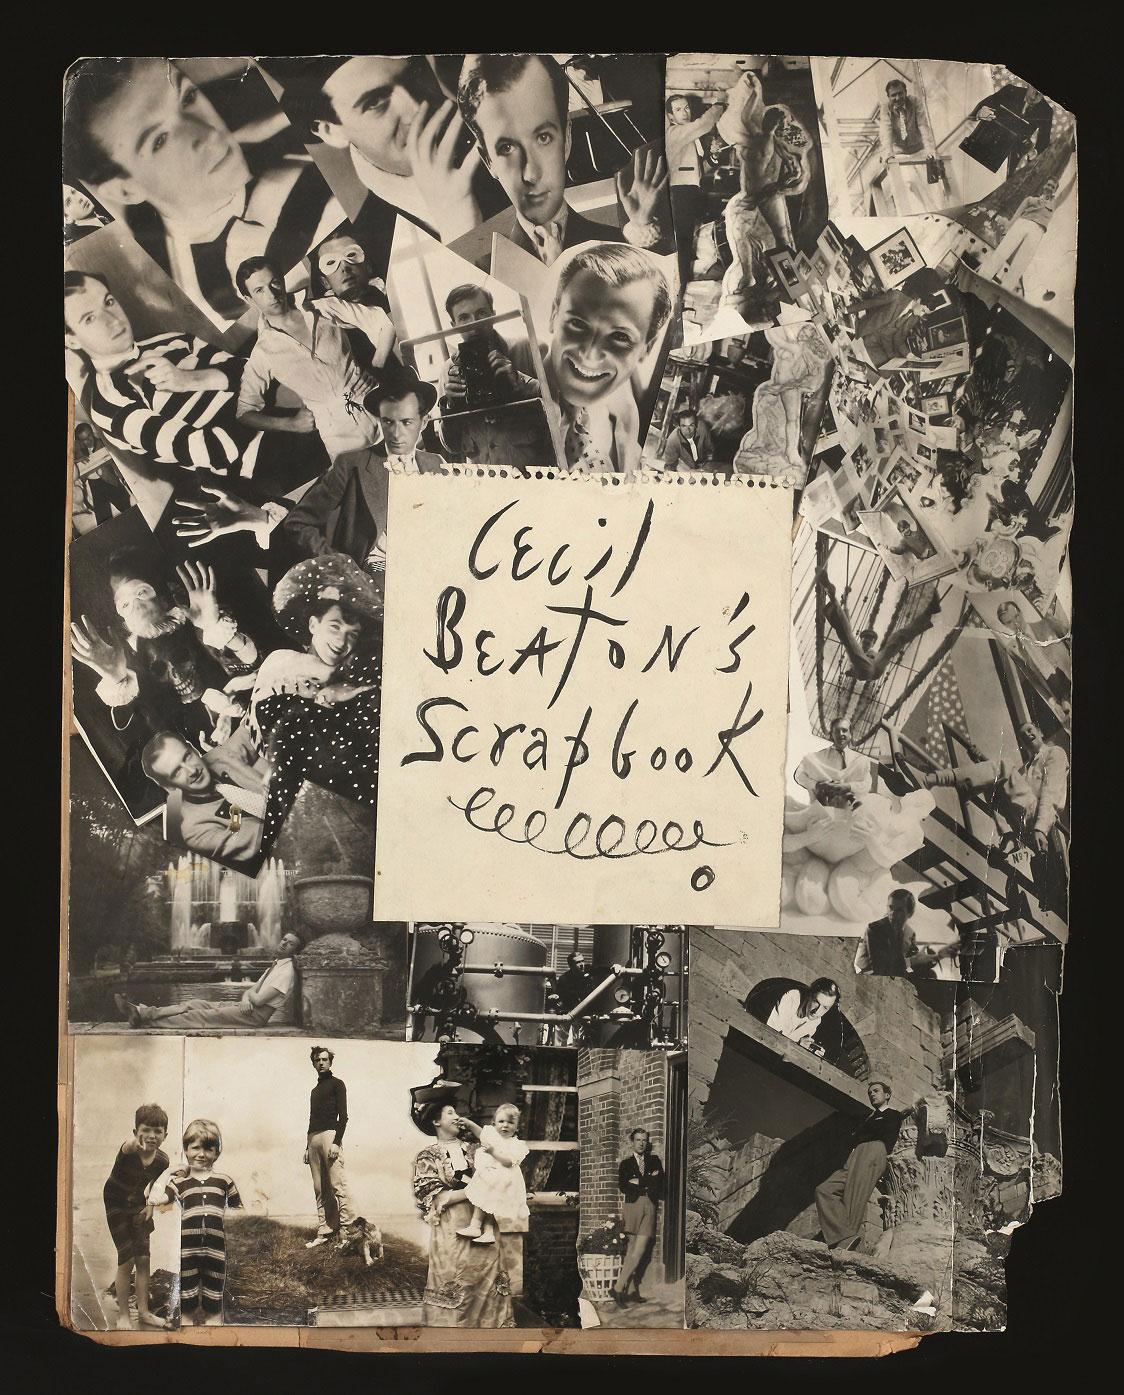 Cecil Beaton. 'Frontispiece montage for Cecil Beaton's Scrapbook, 1937, Ashcombe' 1937